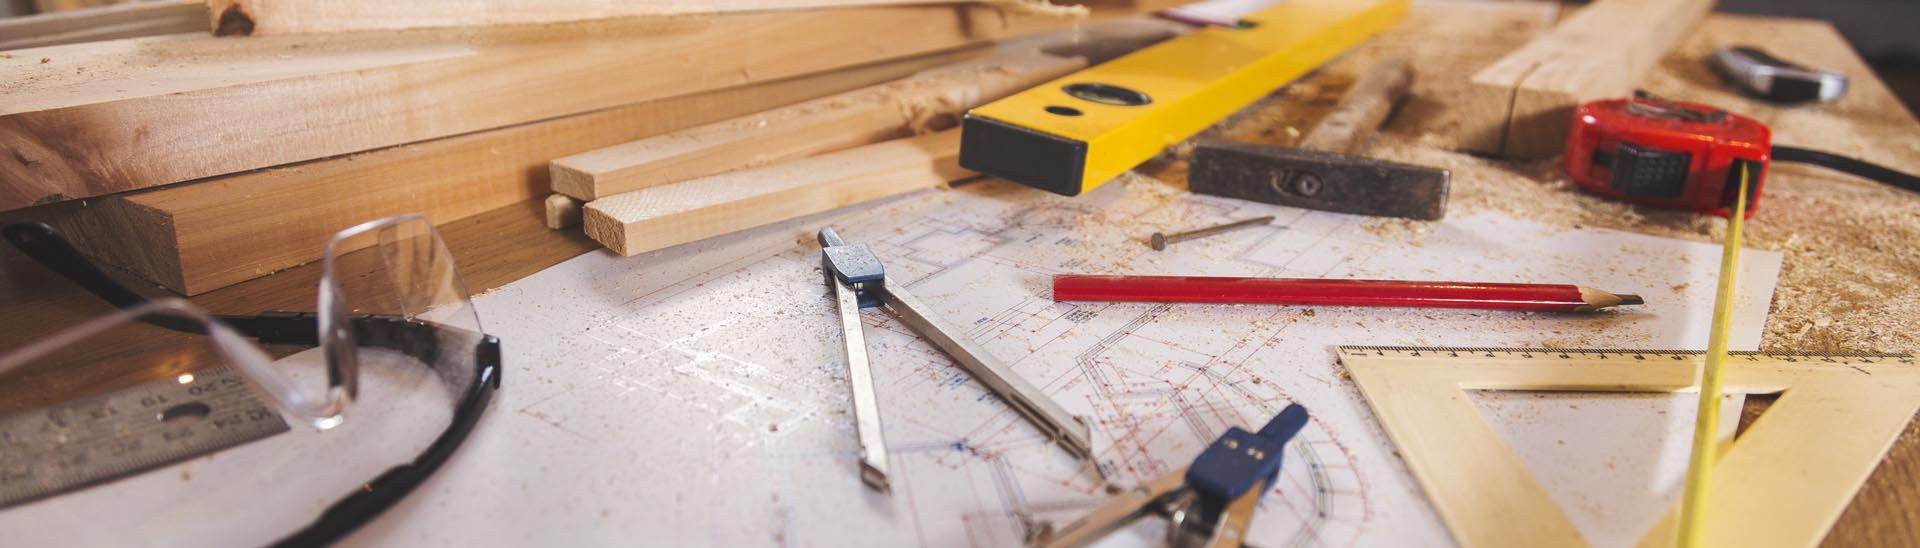 business insurance trade contractors